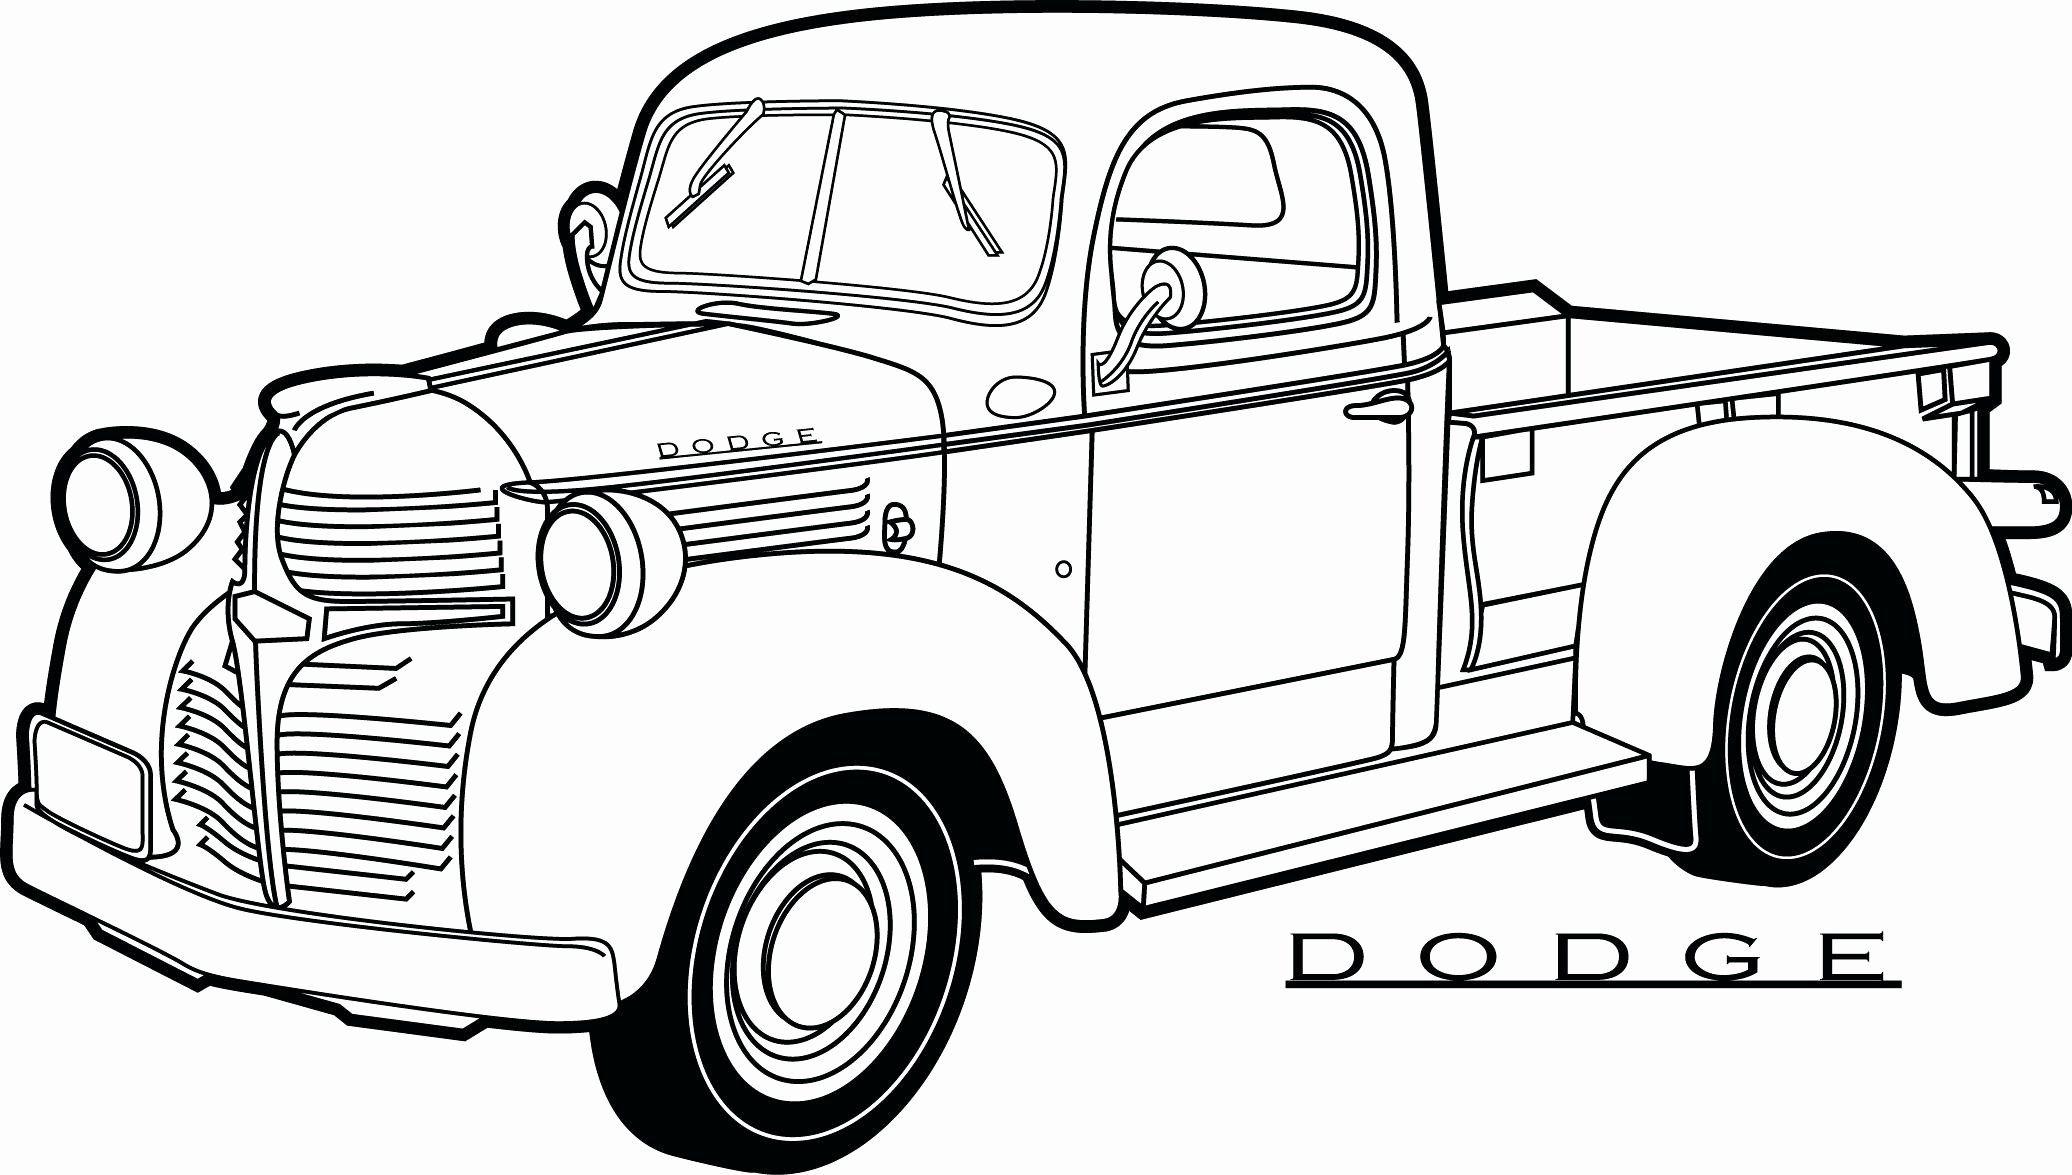 Ford Trucks Coloring Pages Elegant Truck Coloring Pages Truck Coloring Pages Cars Coloring Pages Pickup Trucks